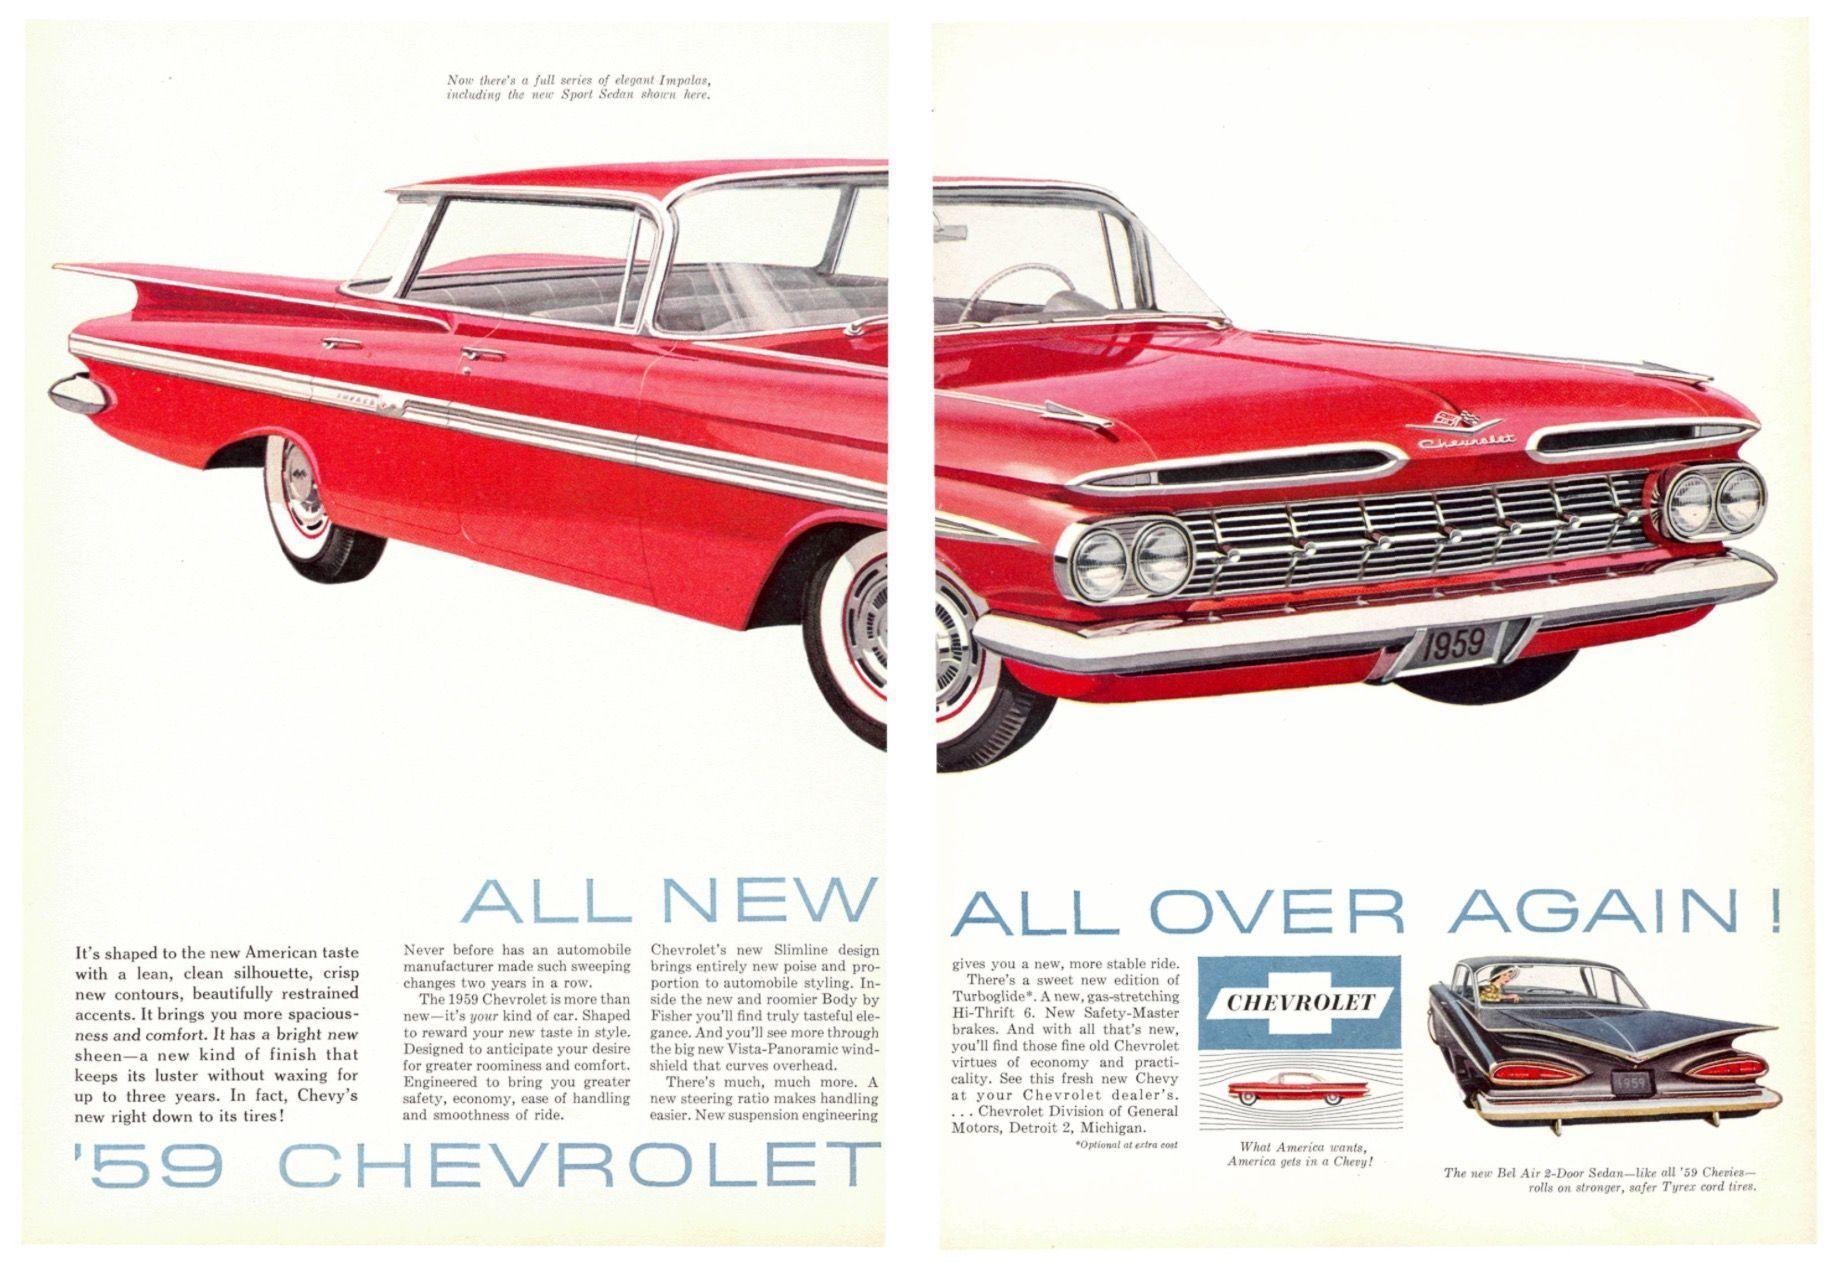 1959 Chevrolet Bel Air Ad Automobile Advertising Car